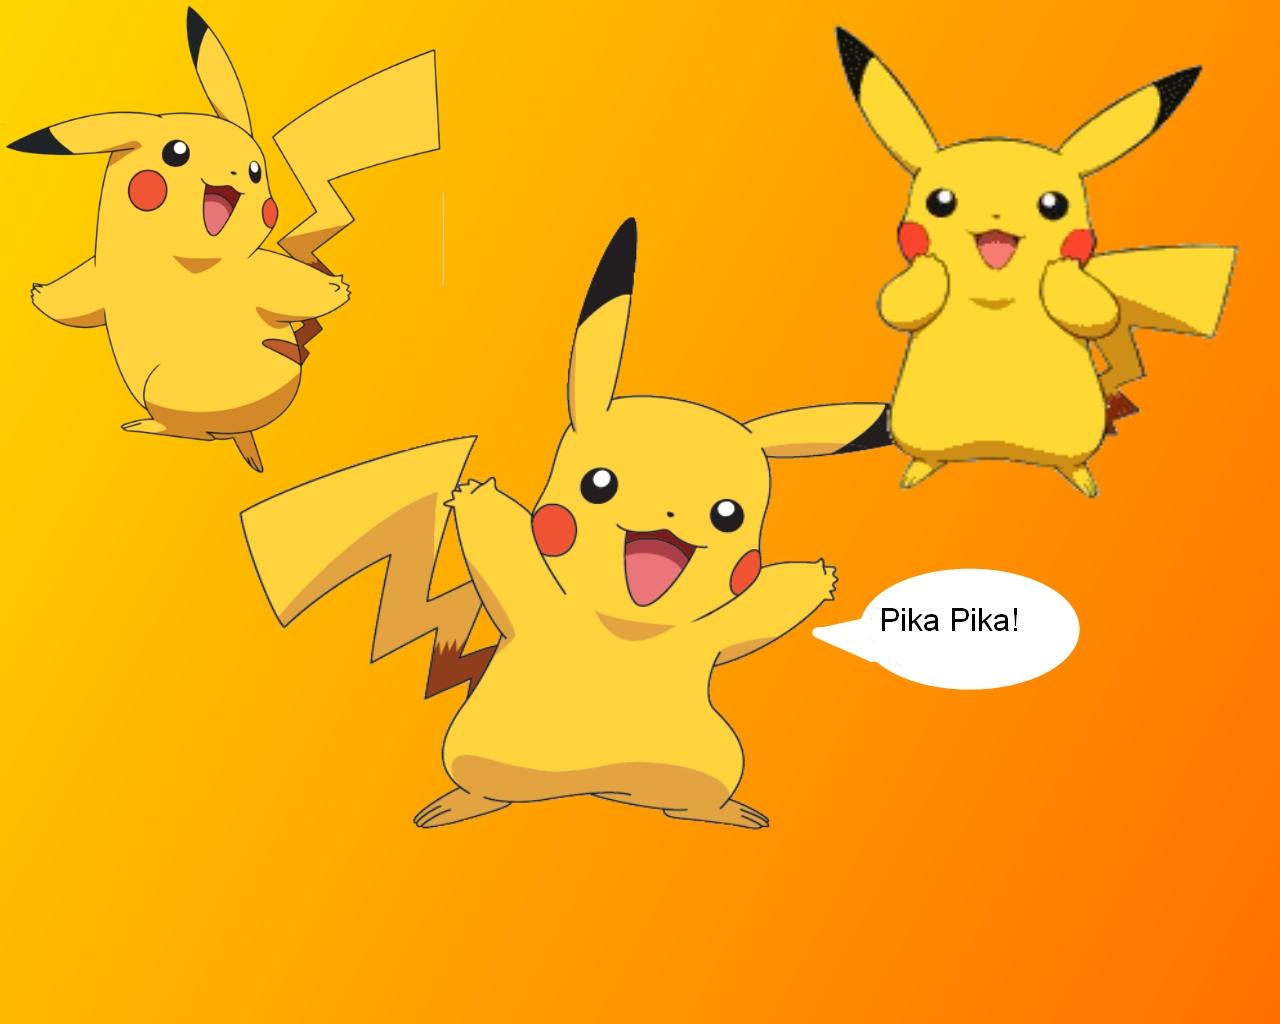 [48+] Cute Pikachu Wallpapers on WallpaperSafari